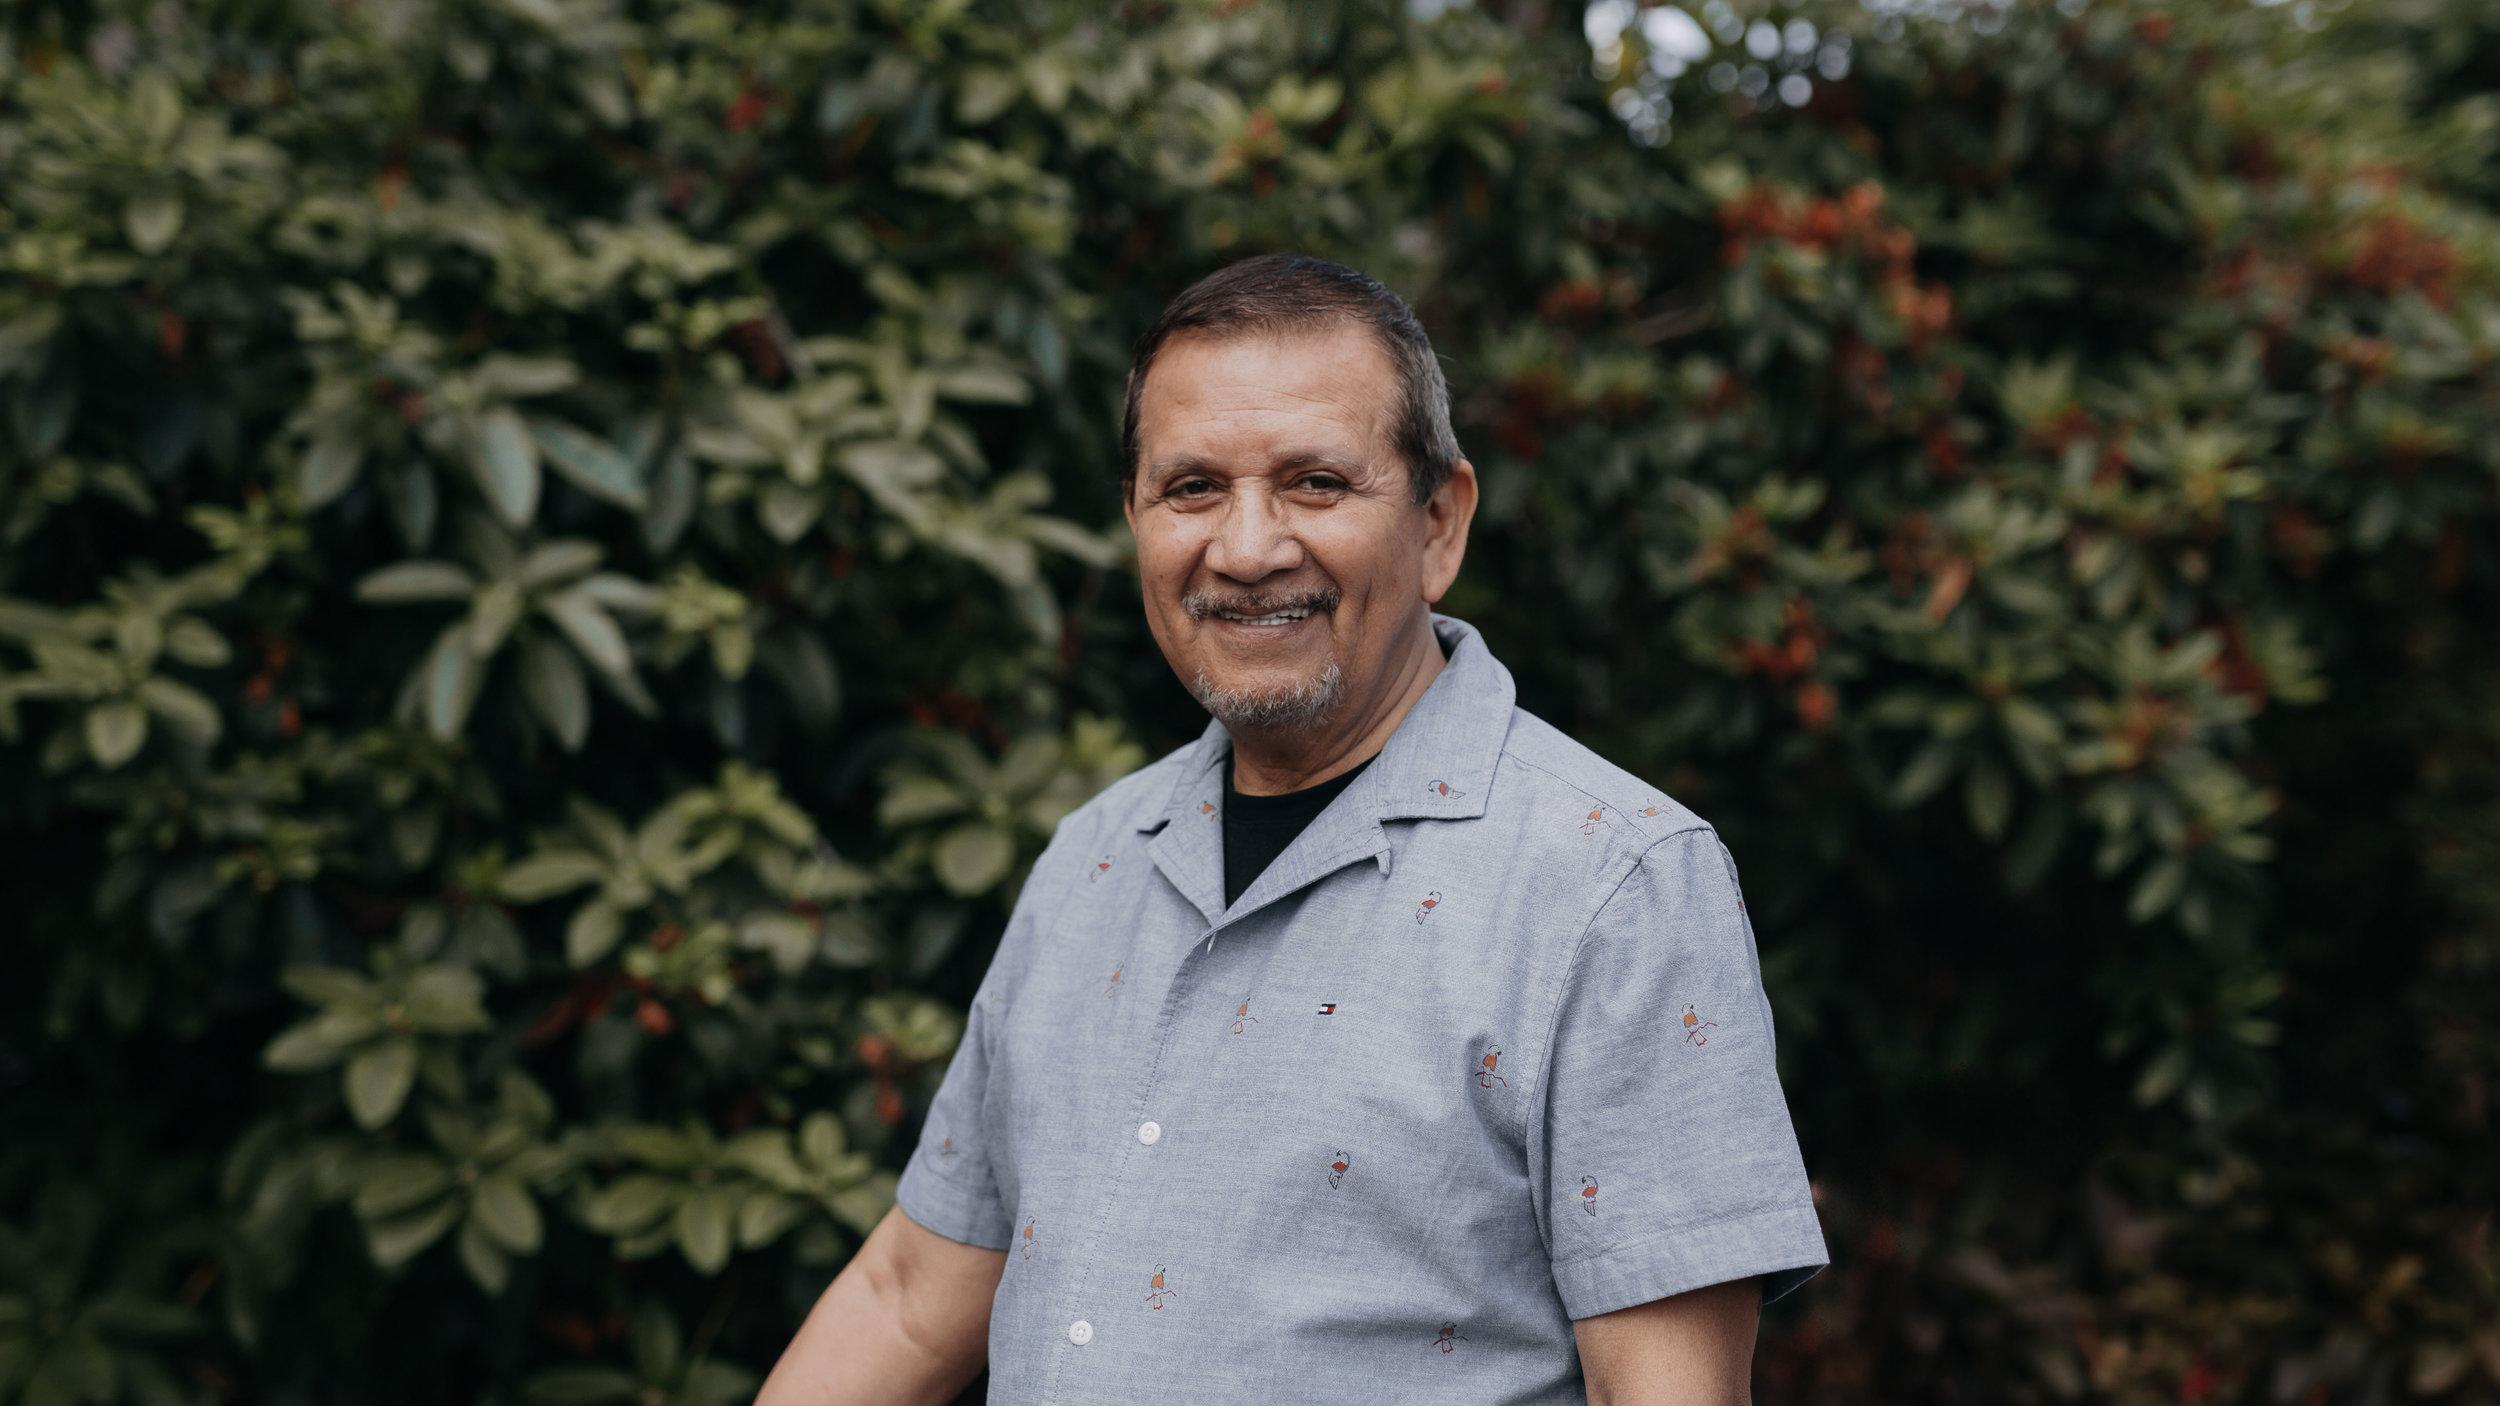 Rev. Dr. Roberto F. Tejada